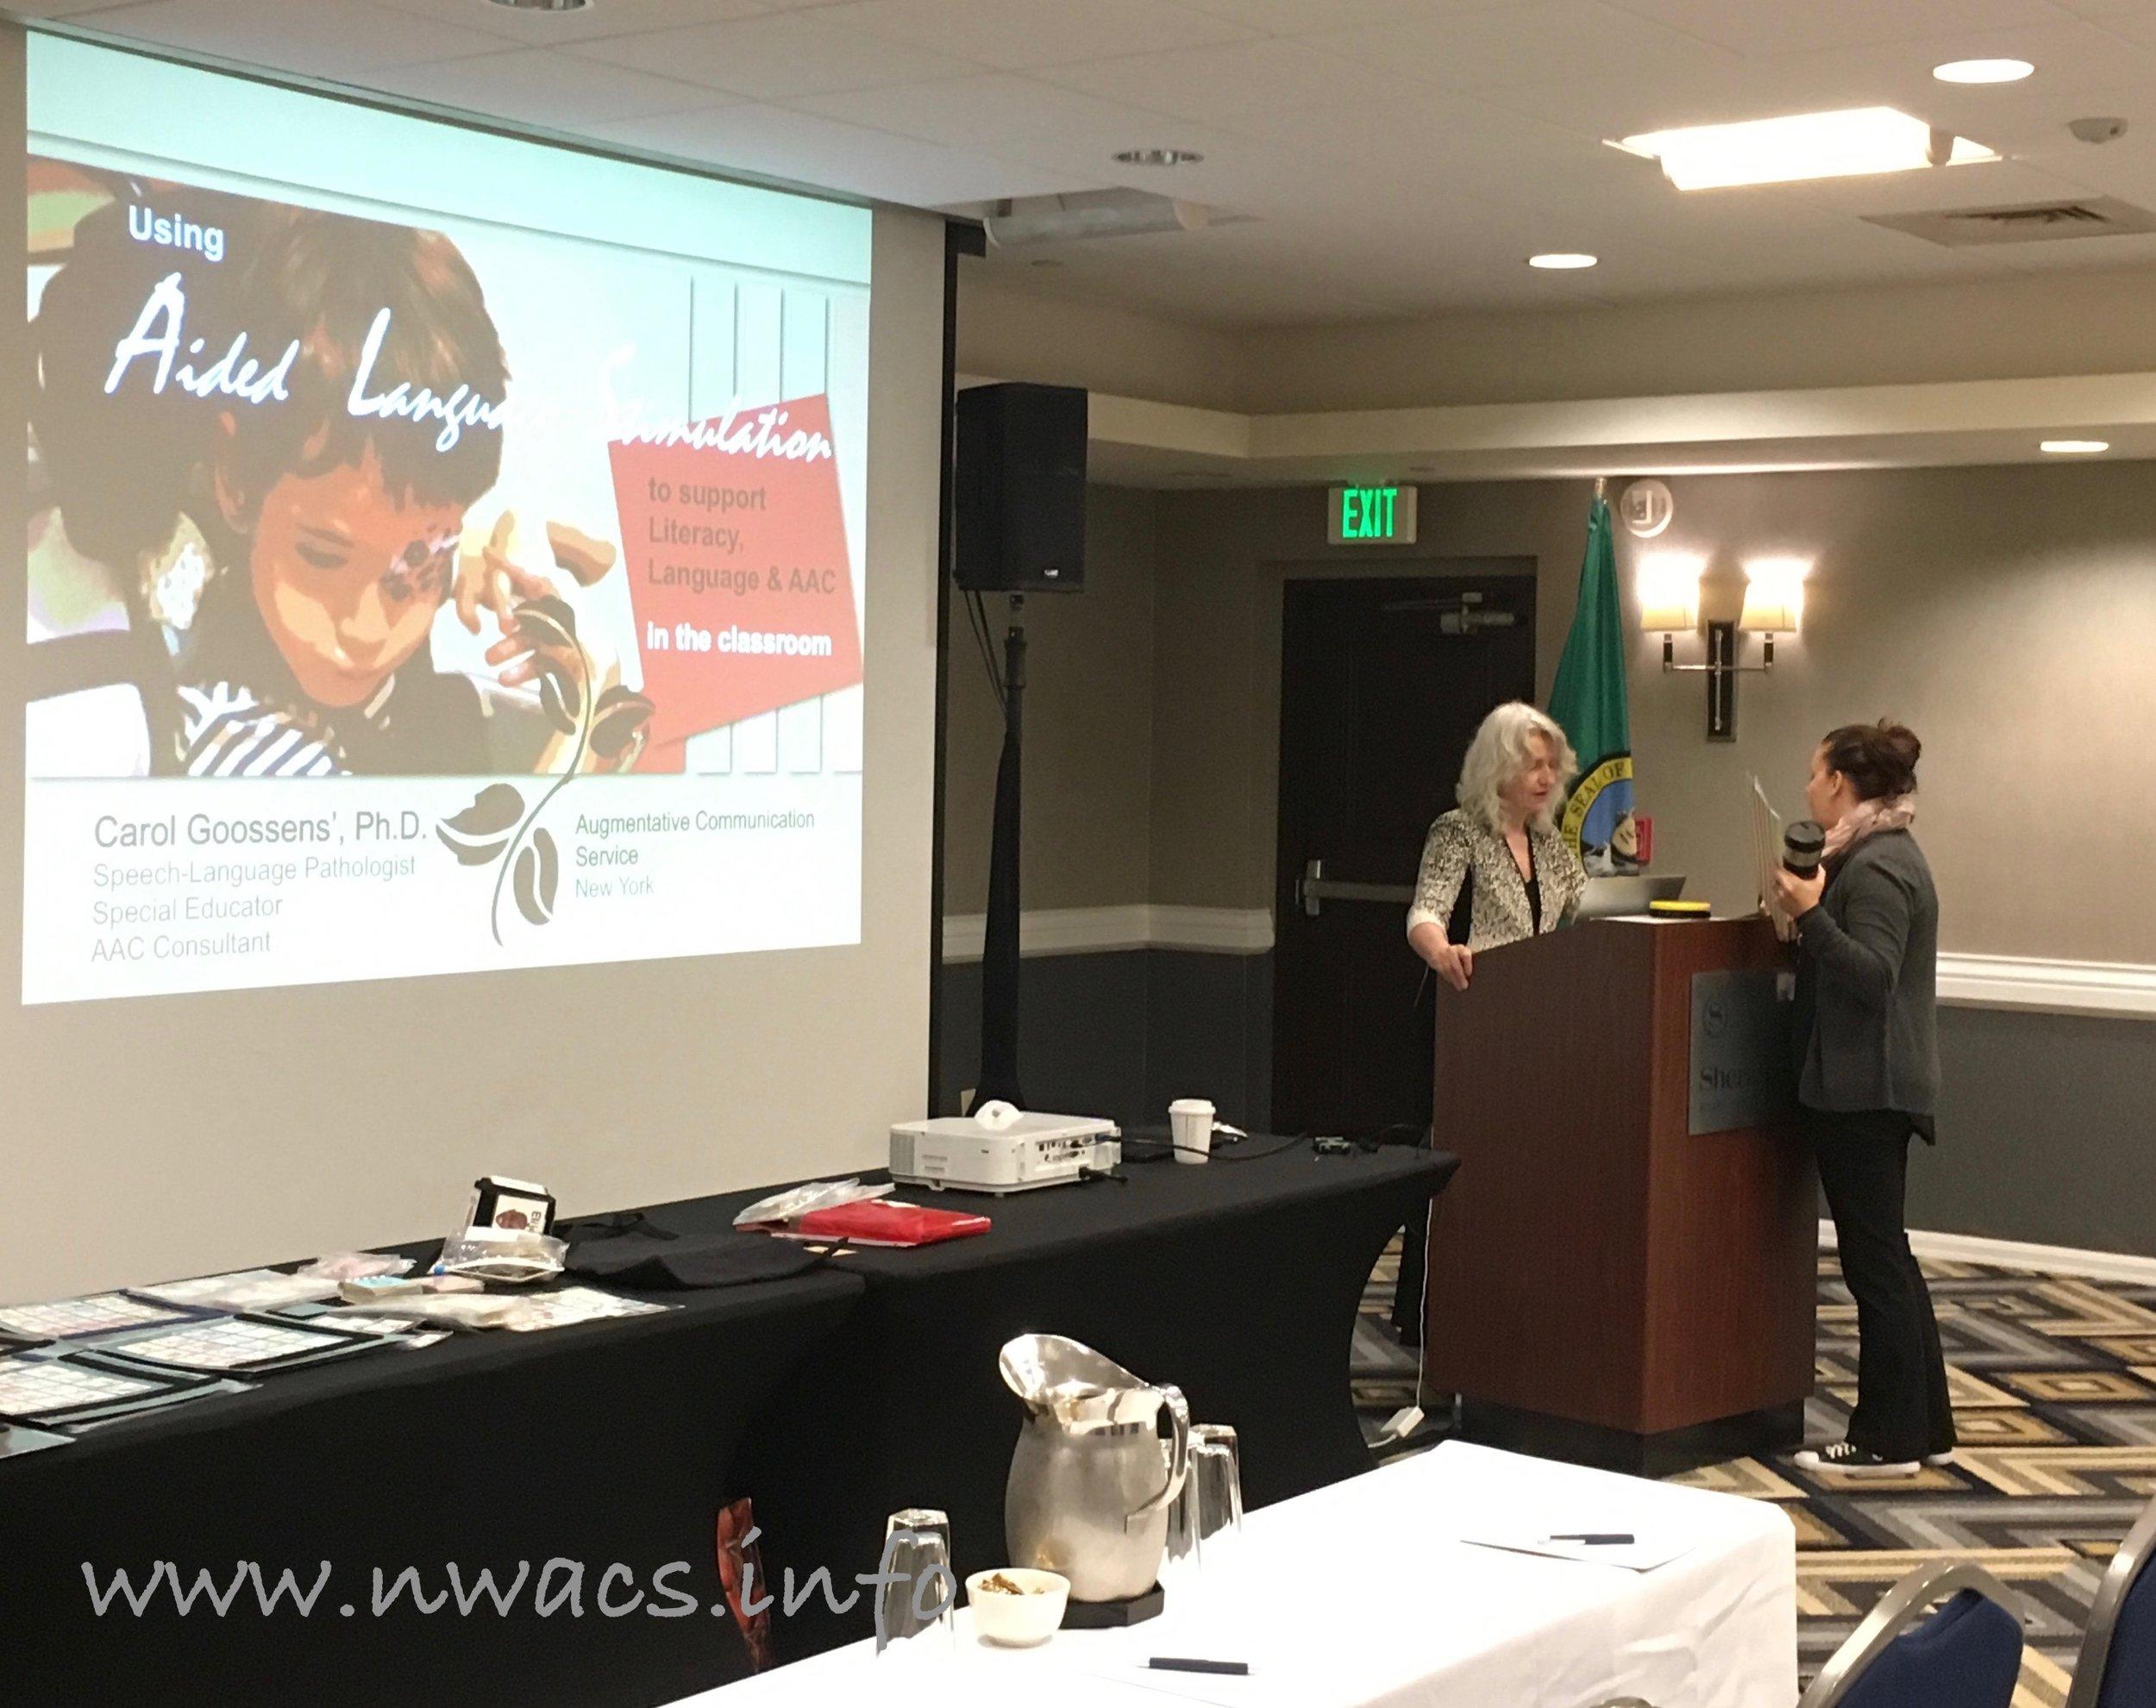 Carol Goossens' & NWACS President Tanna